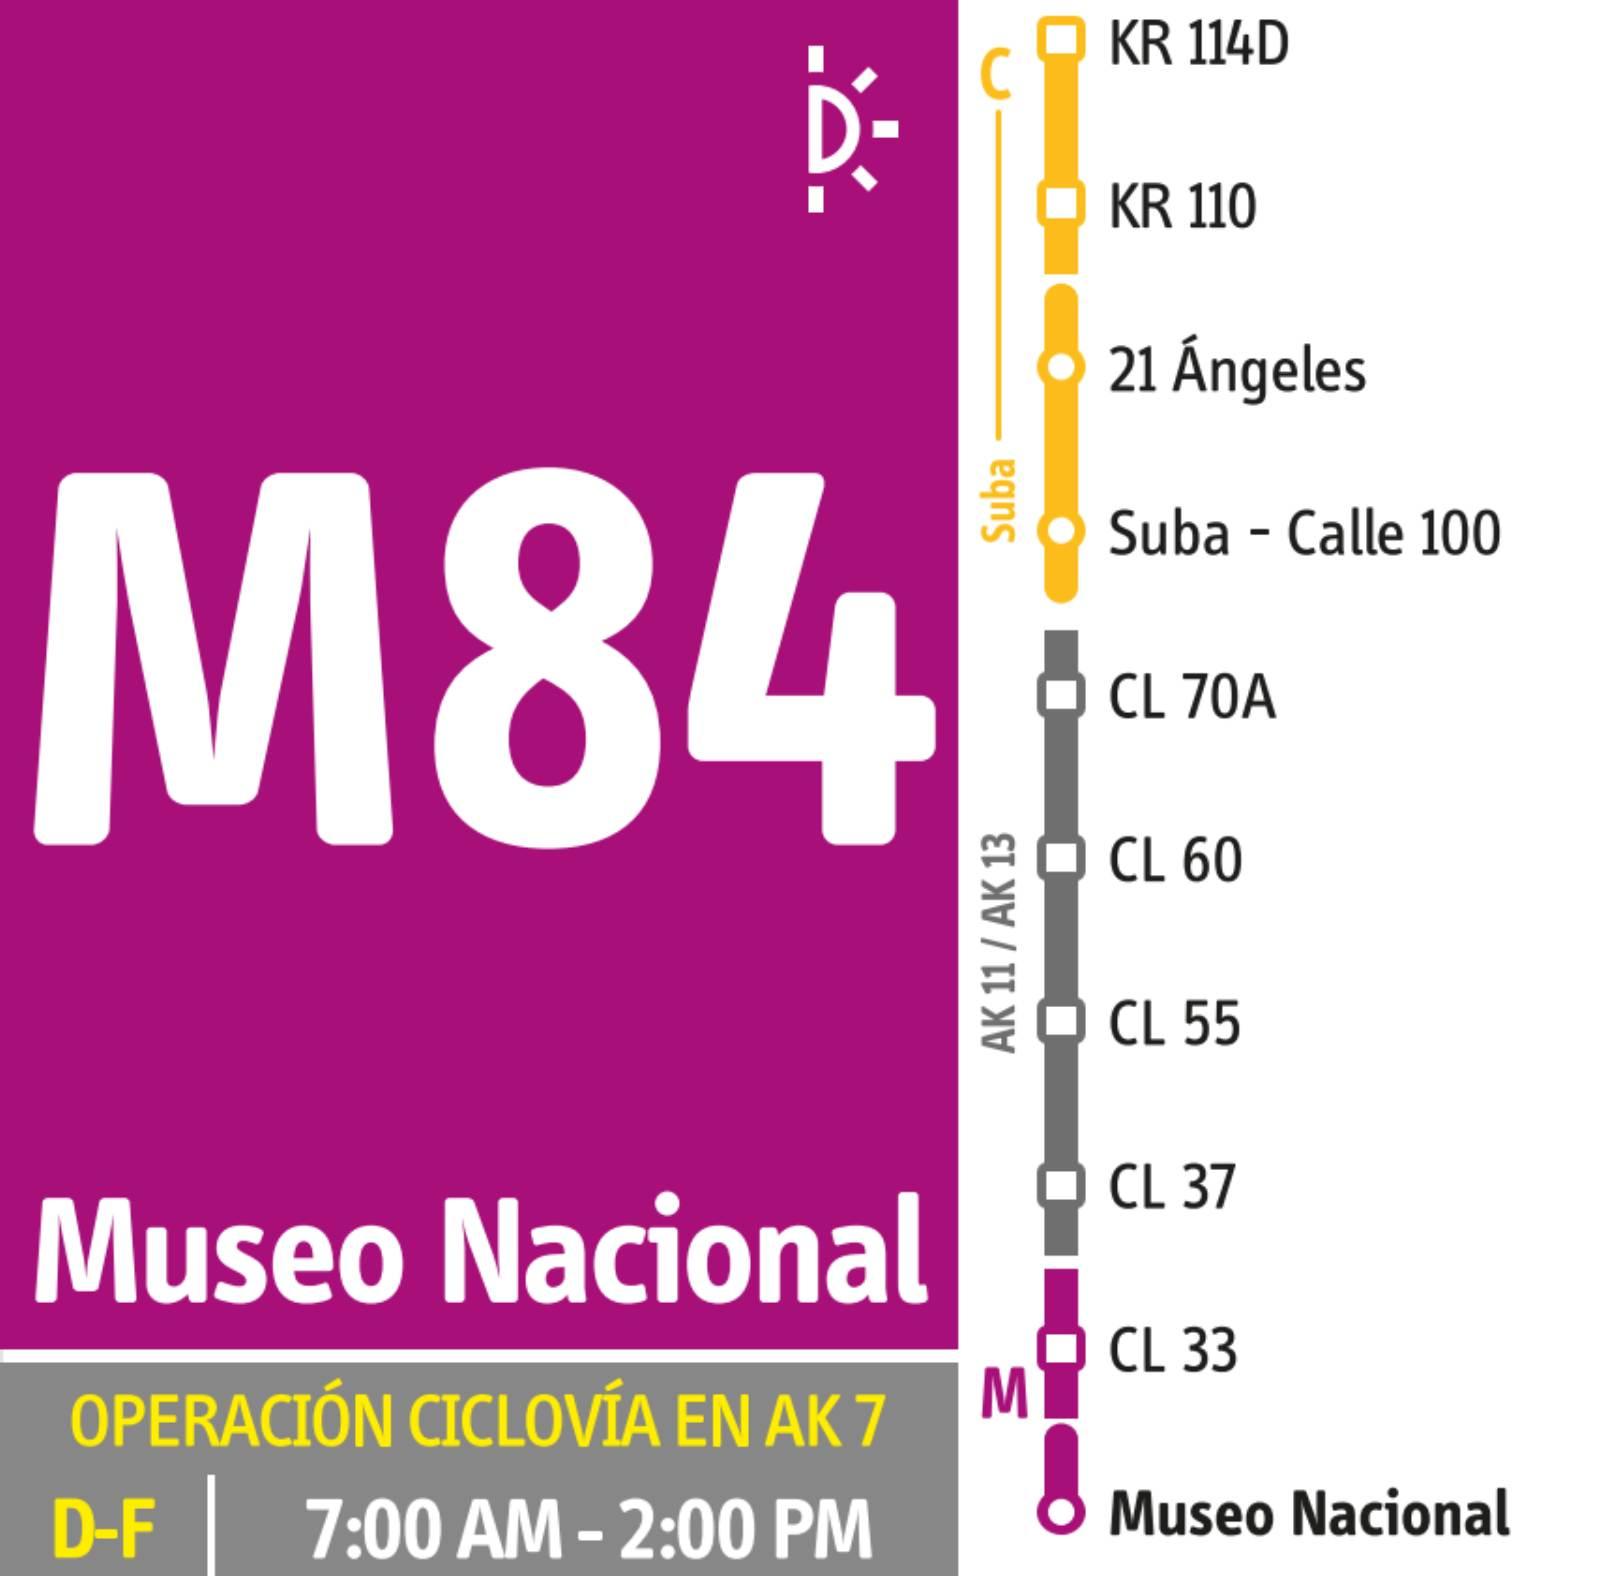 M84-C84 >Museo Nacional- ETB Tibabuyes , festivos - (dual)